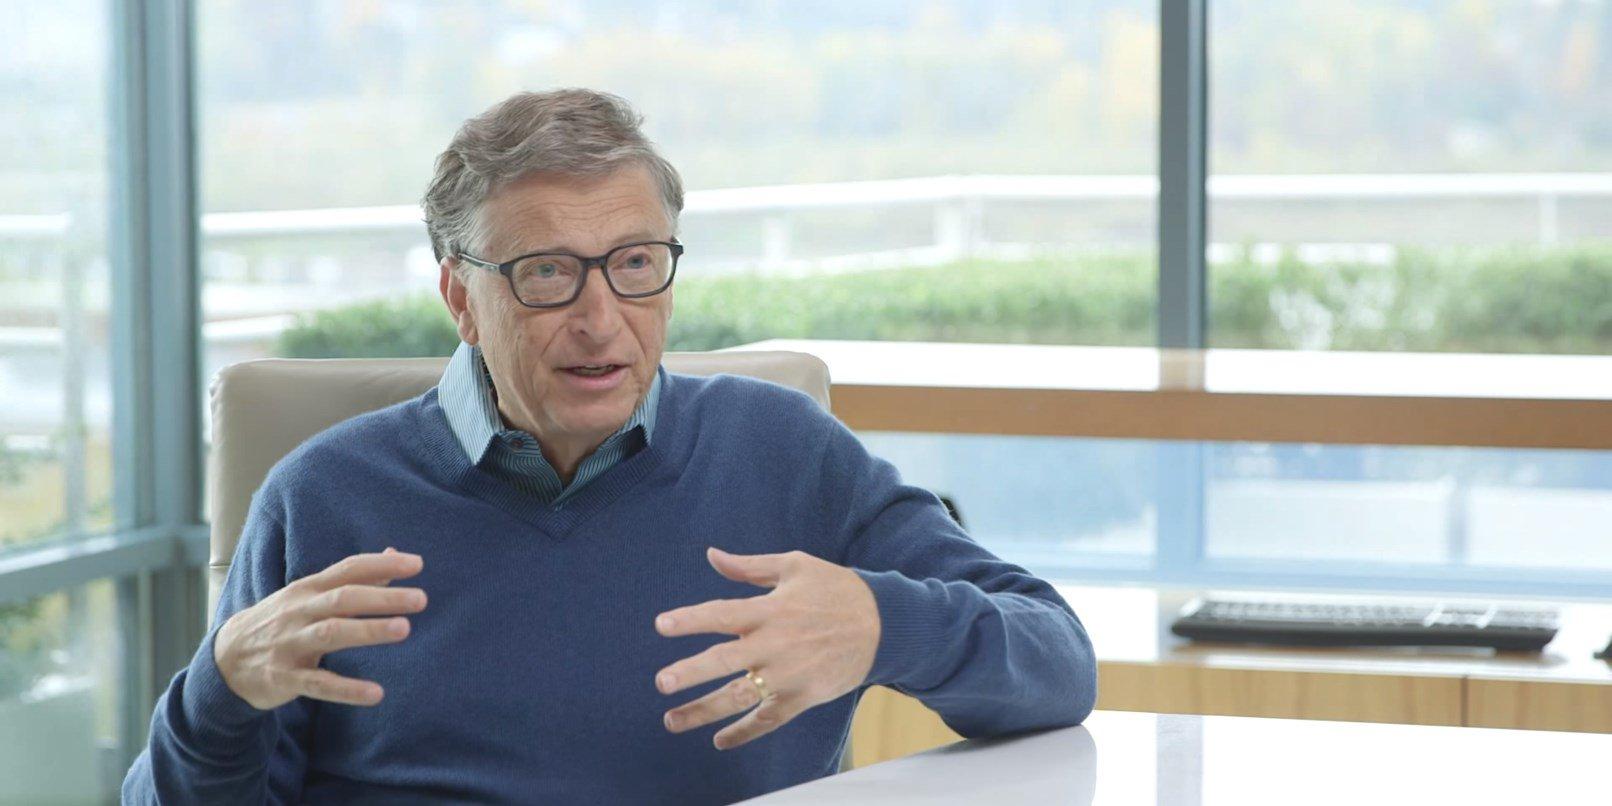 RT @TheNextWeb: Bill Gates and Mark Zuckerberg join tech moguls to fund clean energy tech https://t.co/djgOg5nB6O https://t.co/wr44kOGLJq